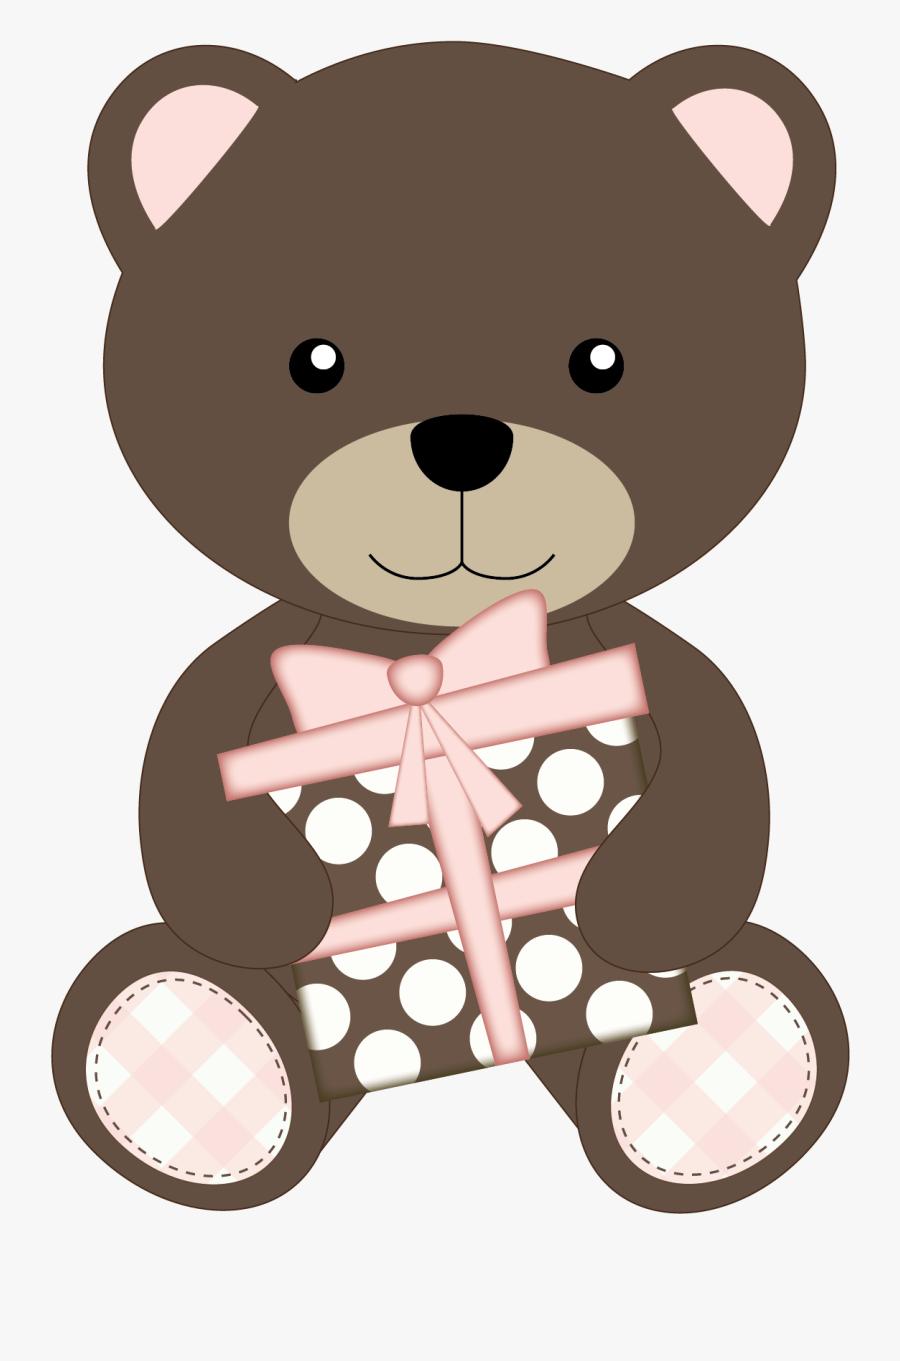 Http - //danimfalcao - Minus - Com/mygimocebbww - Cute - Baby Shower Teddy Bear Clip Art, Transparent Clipart